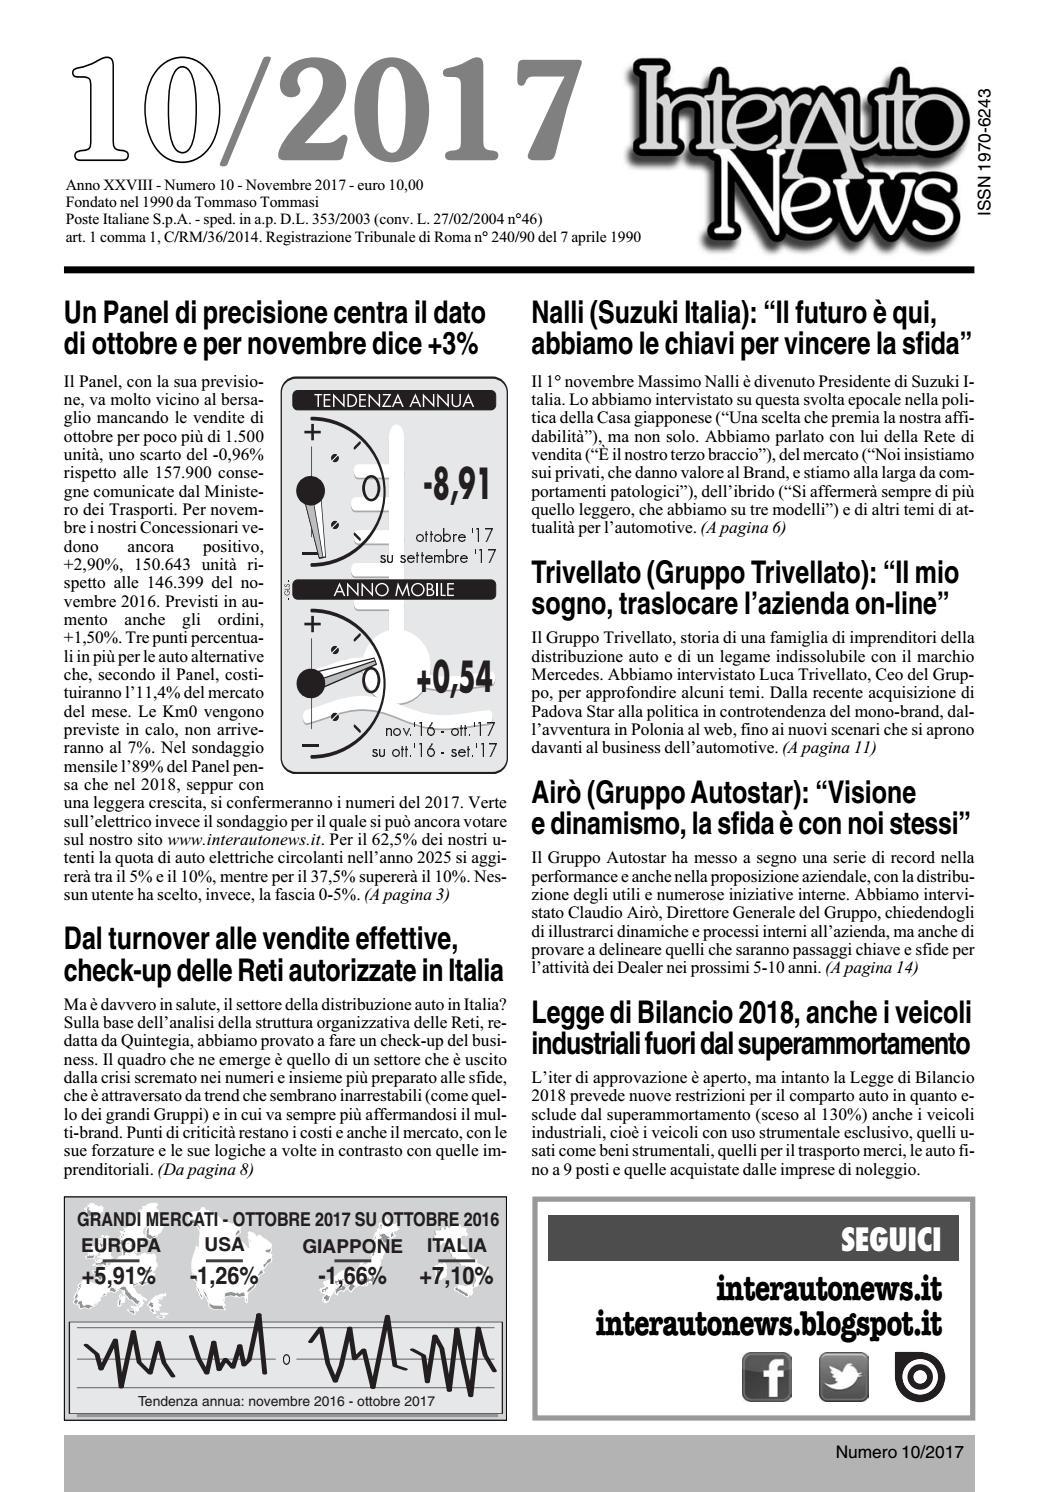 Manuali Officina ISUZU Guarda i Modelli! Assistenza e Riparazione